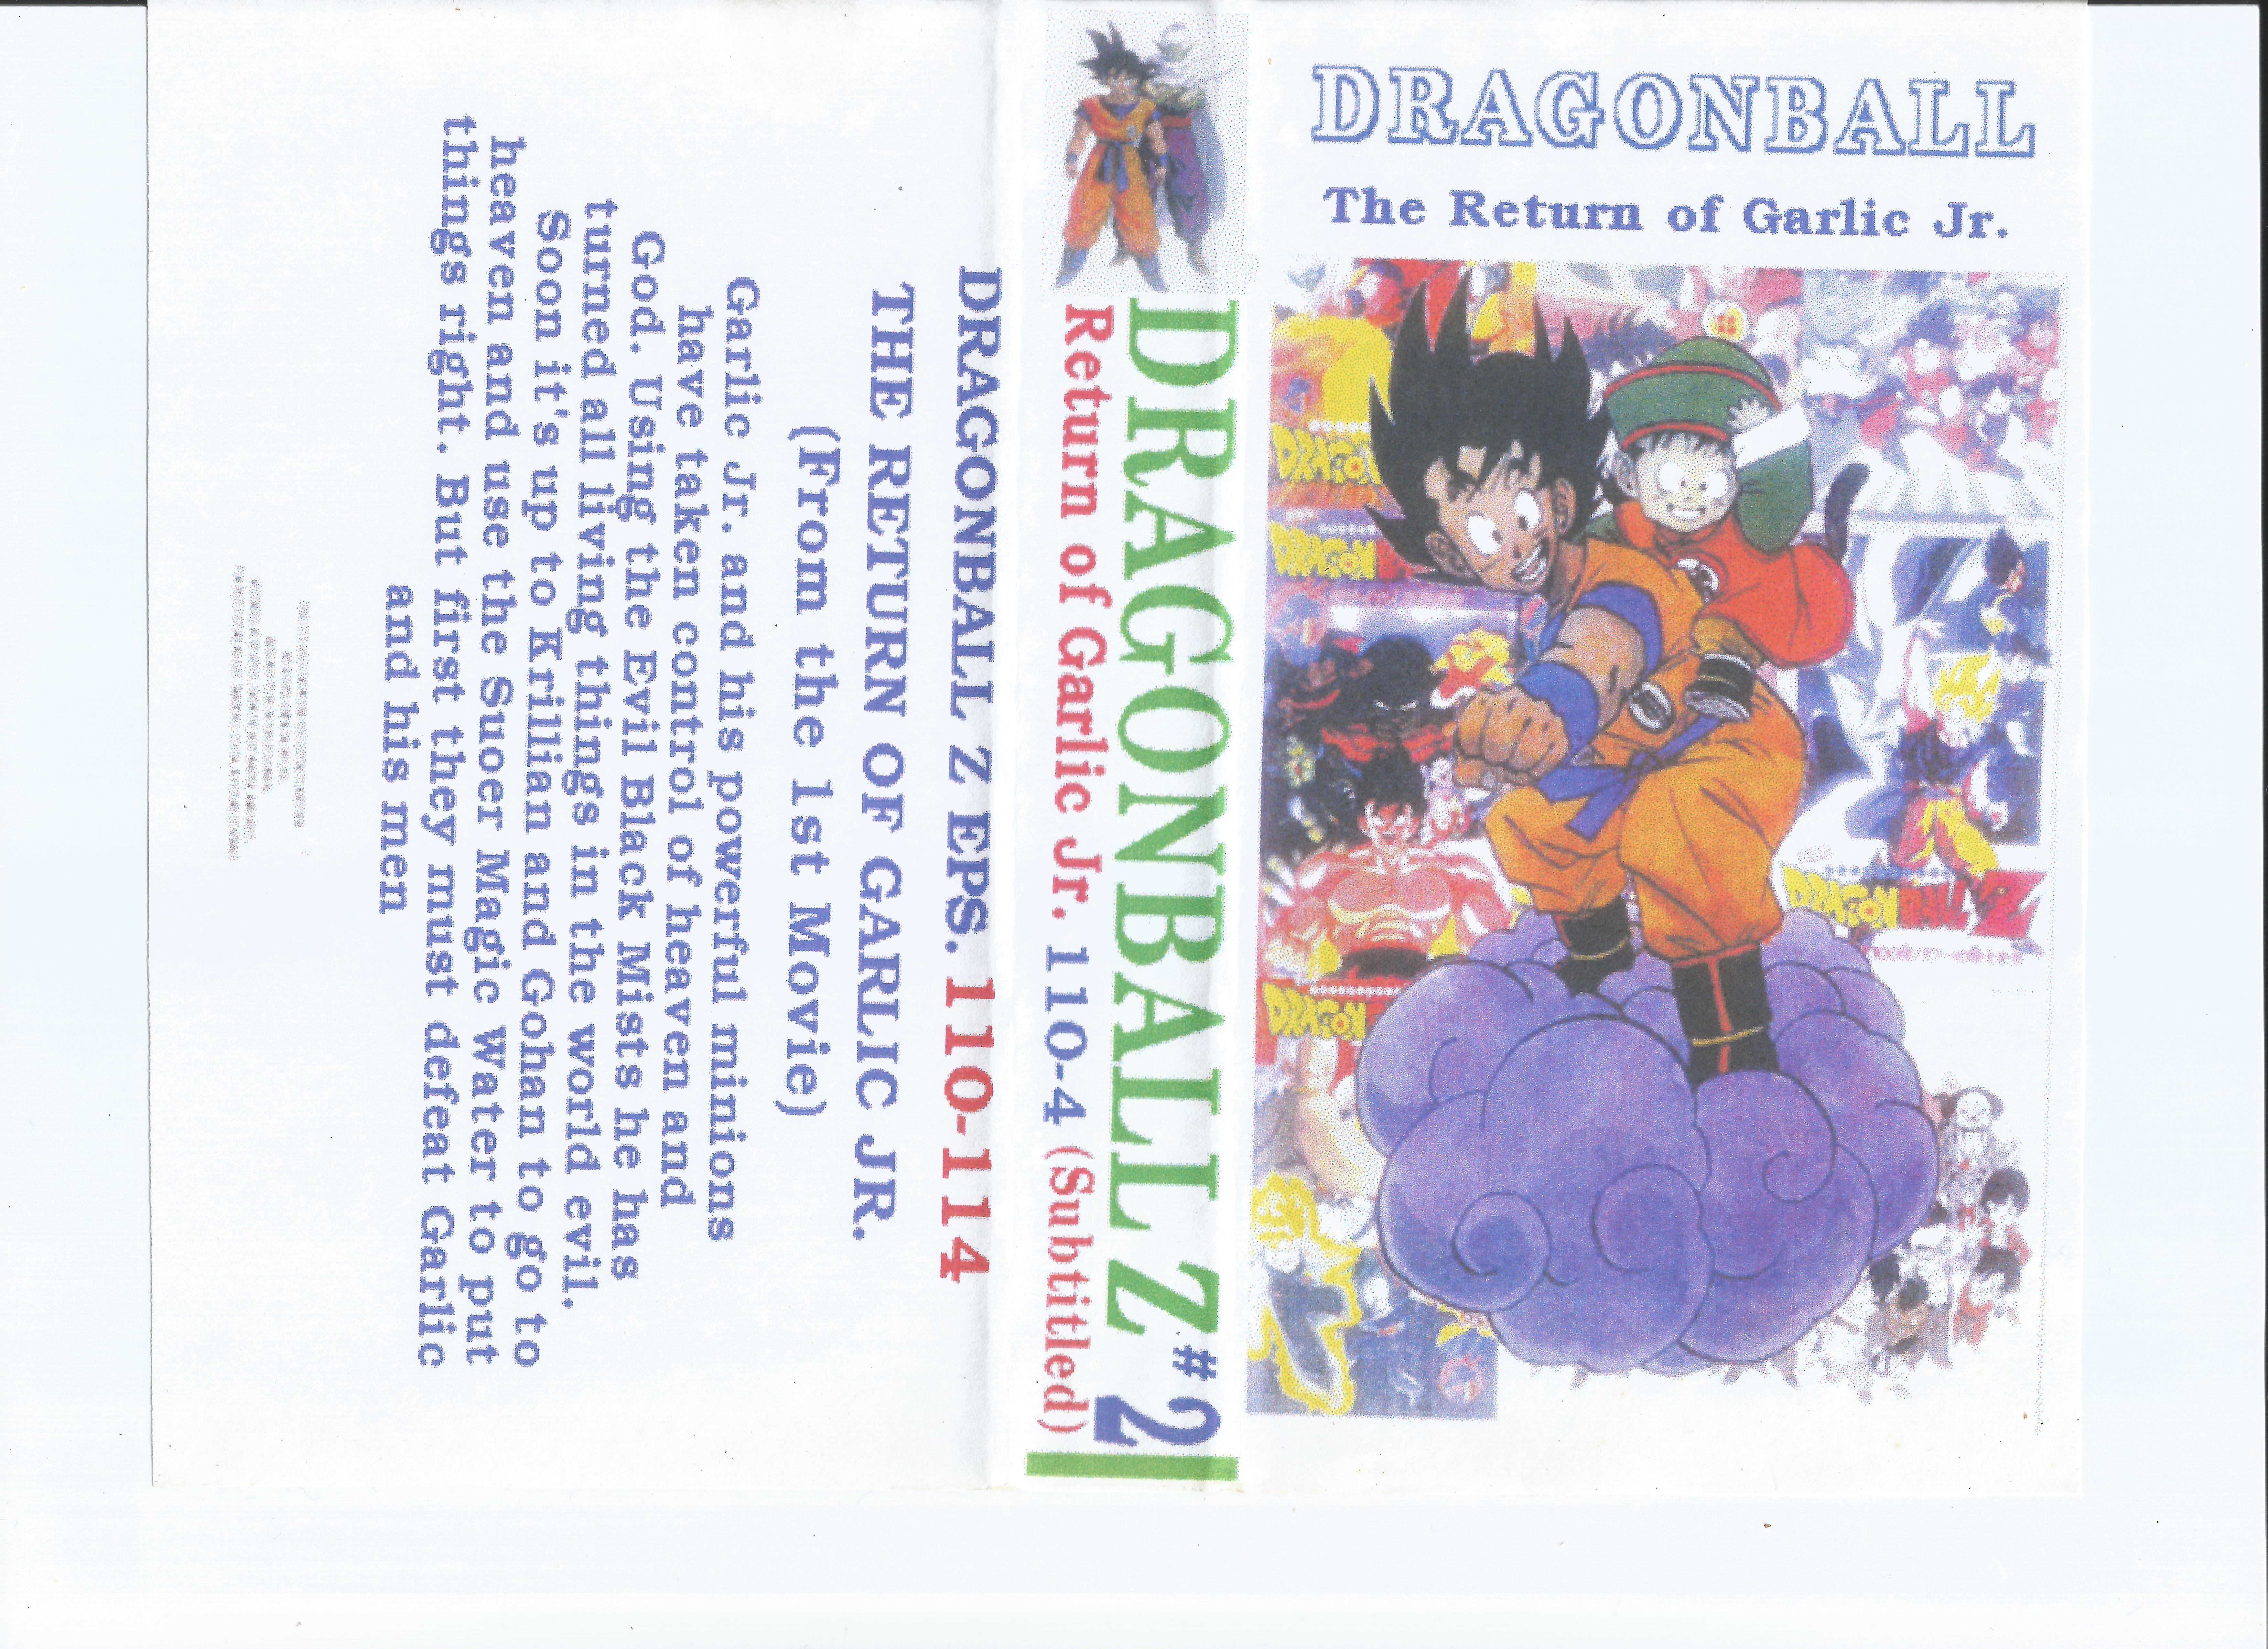 Dragon Ball Vhs Fansub Art Girigiri Sekai Kyokugen Free Download Borrow And Streaming Internet Archive Garlic may also refer to: internet archive